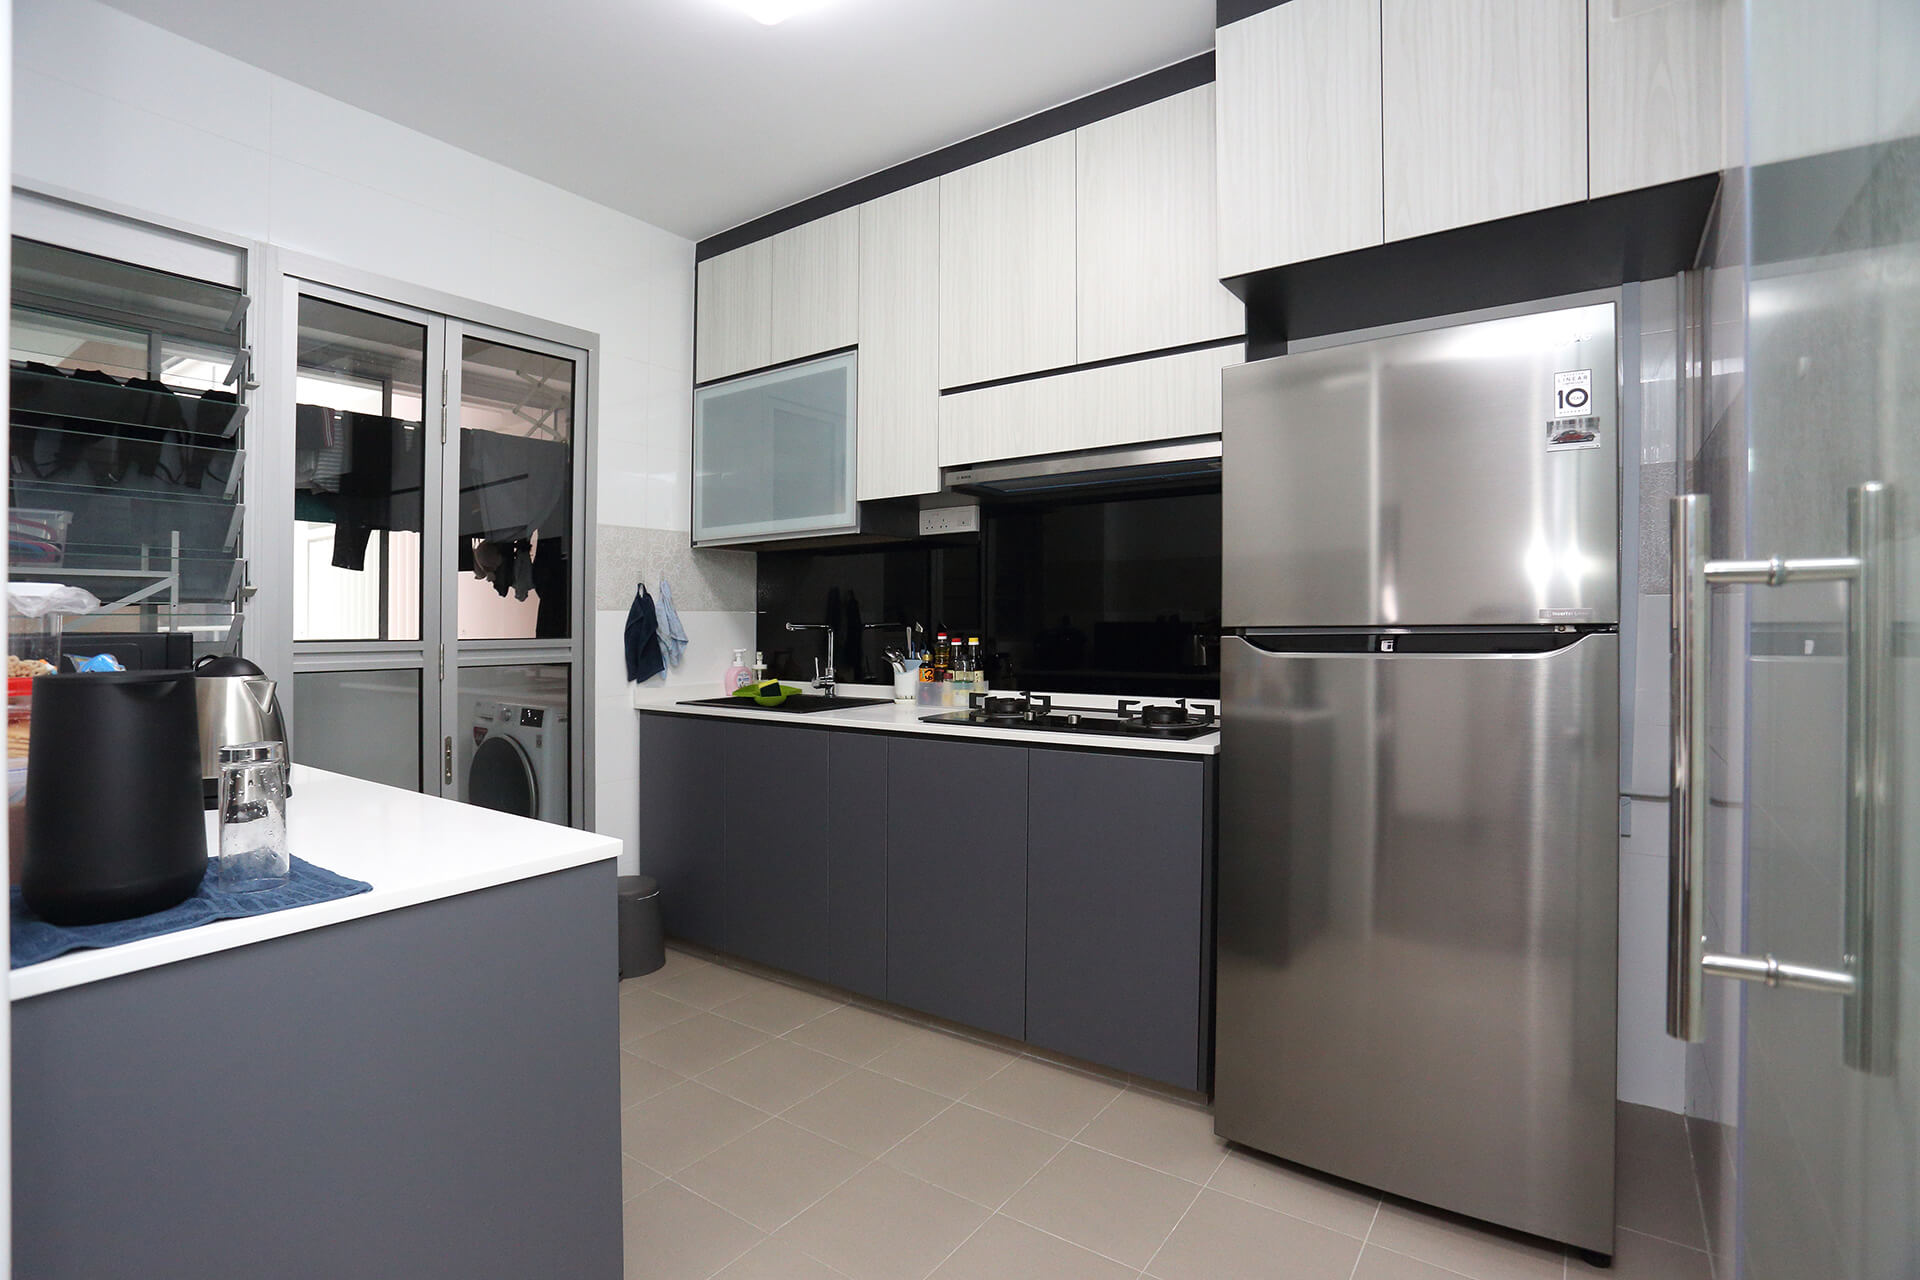 Minimalist Home Interior Design Singapore Kitchchen Full View with Wares